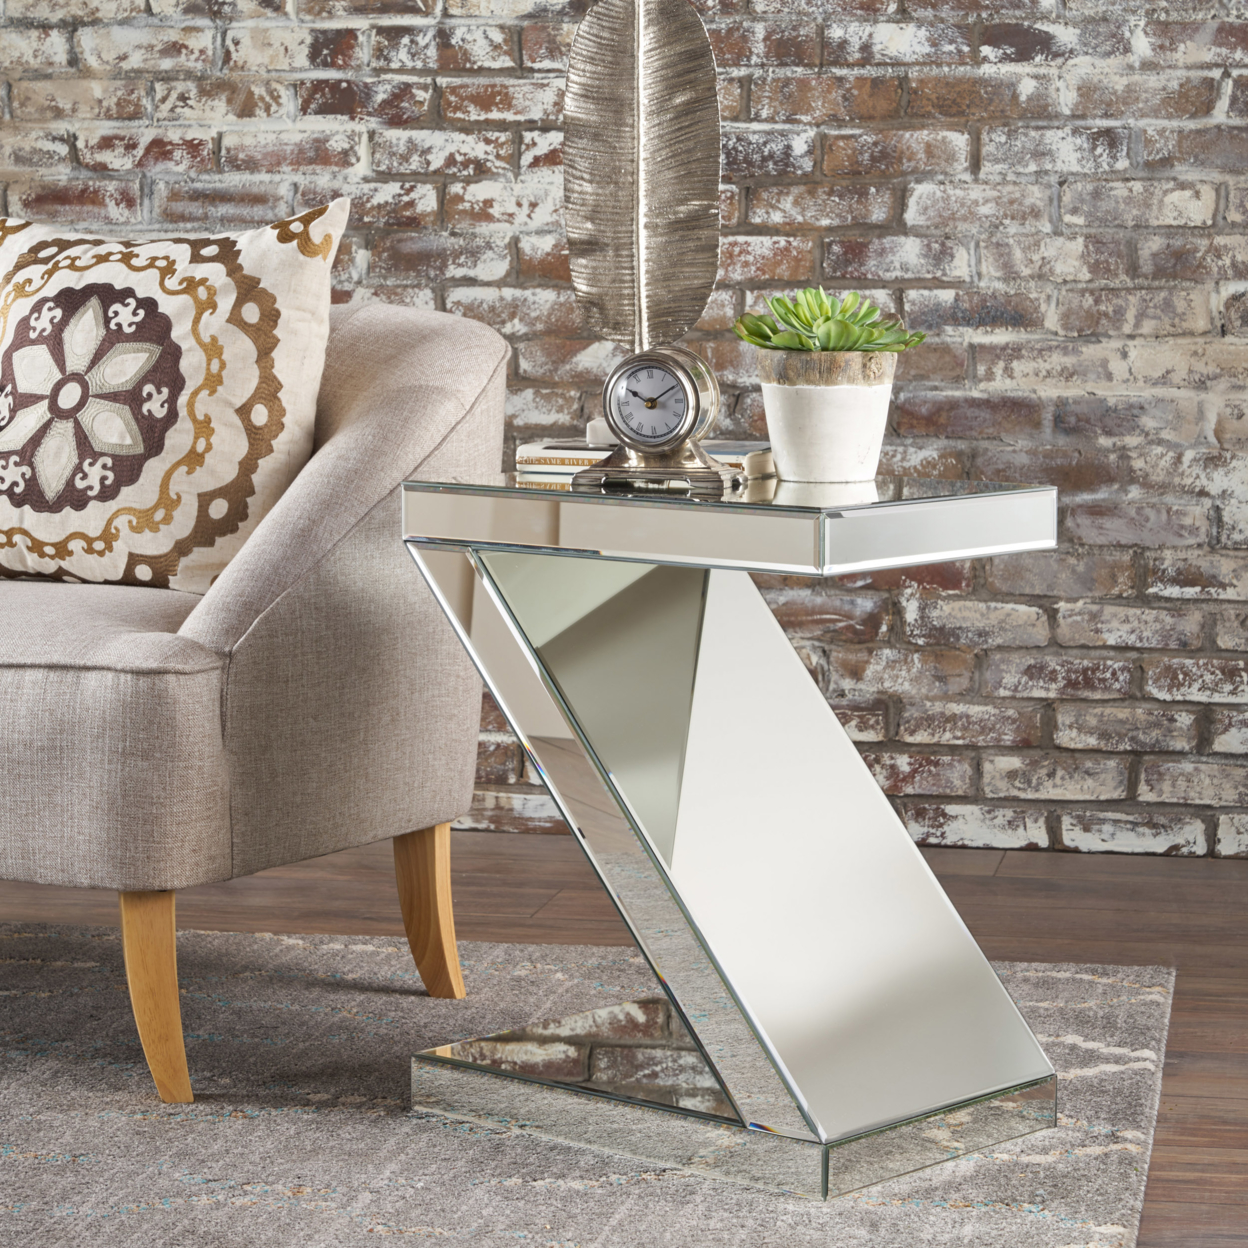 Adu Mirrored Z Shaped Side Table